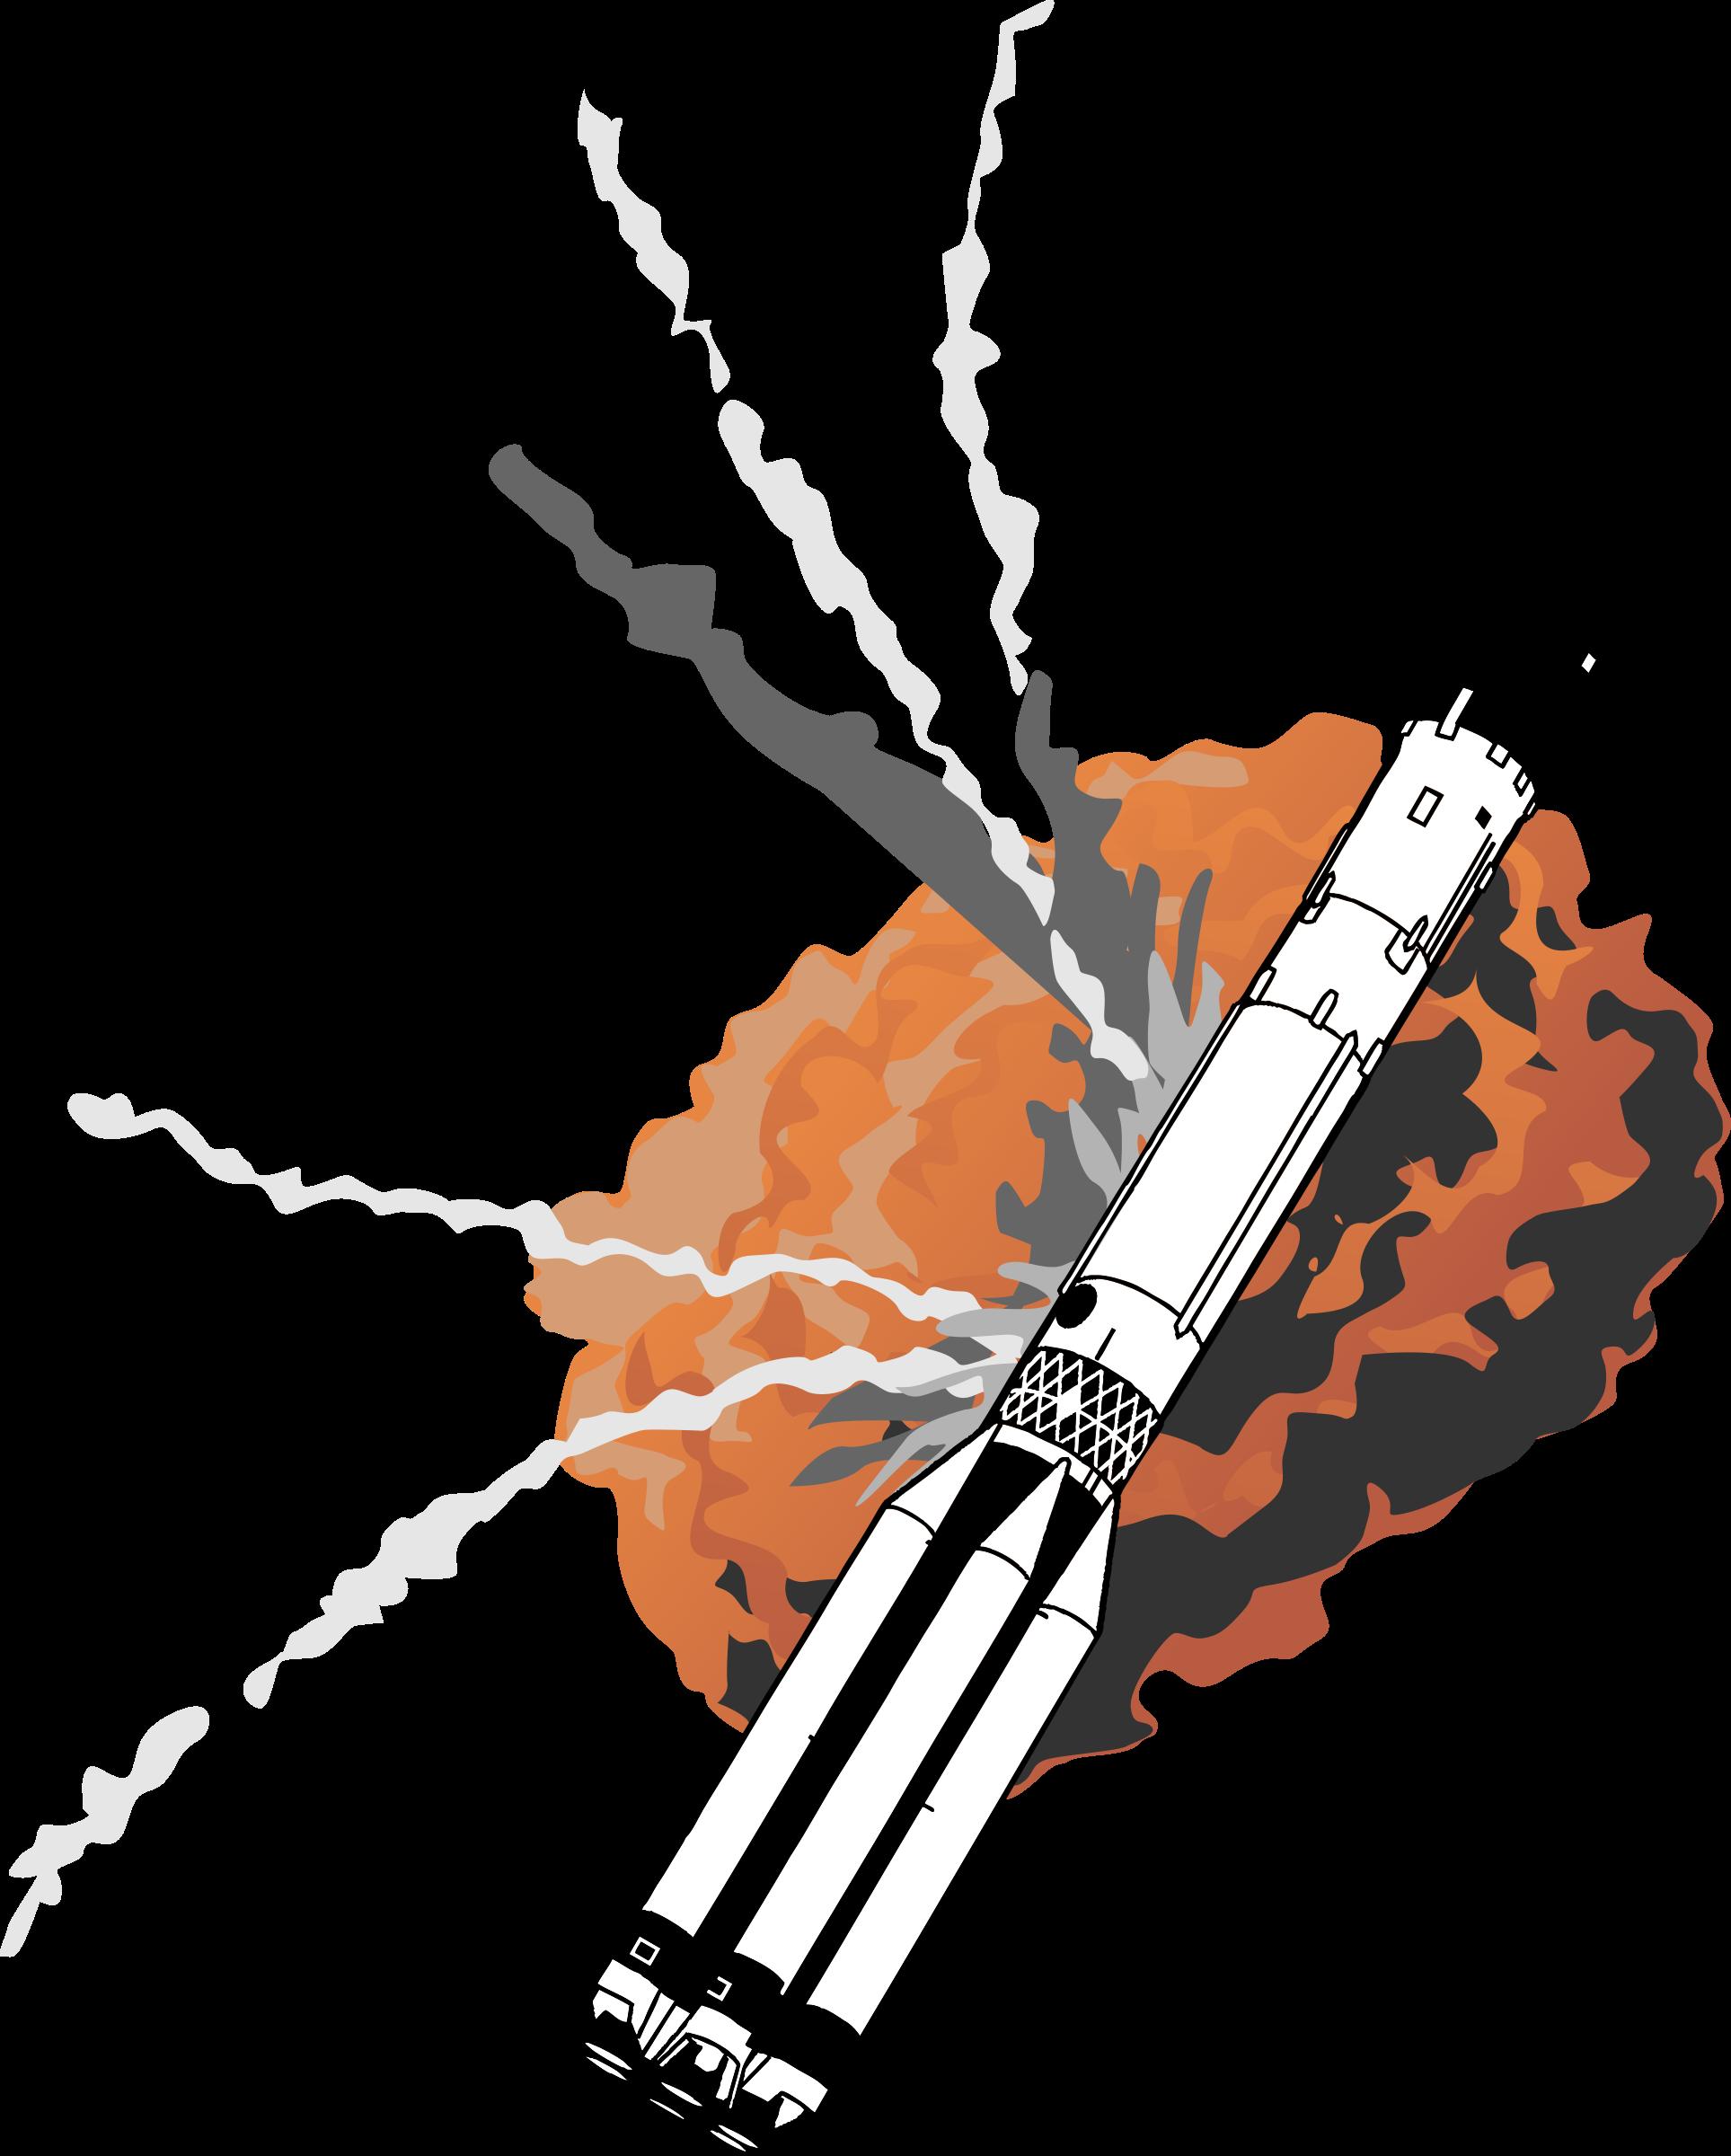 Spaceship Clipart Spaceship Nasa Spaceship Spaceship Nasa